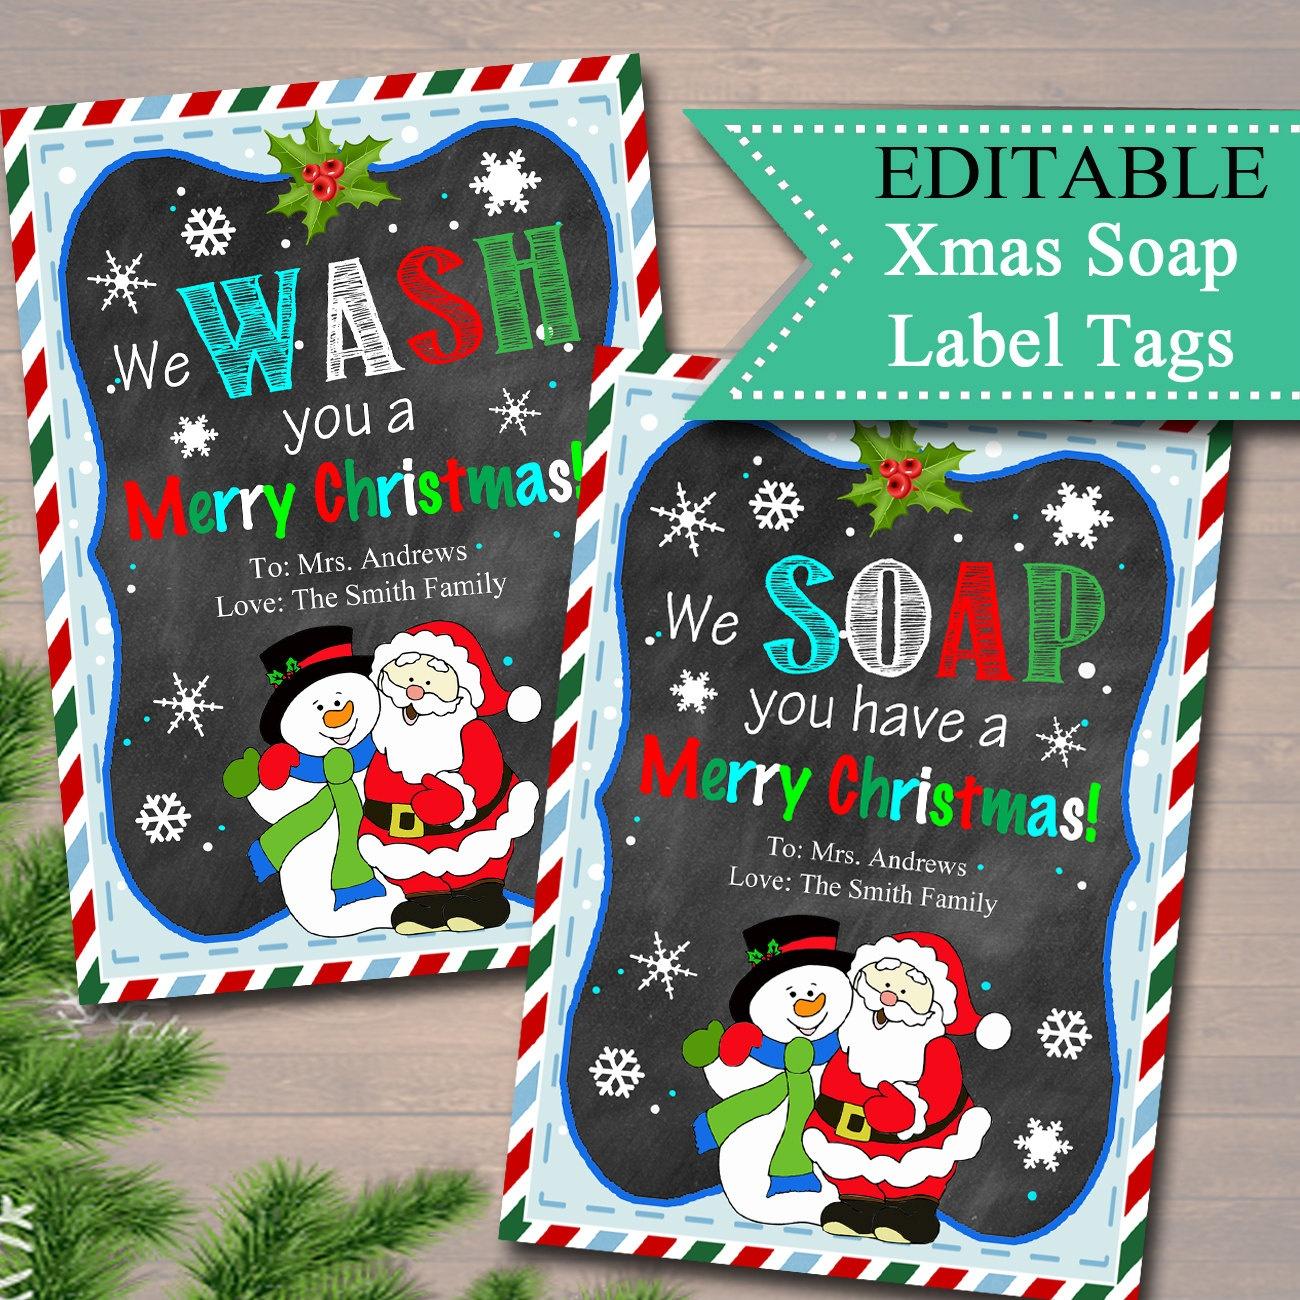 Editable Christmas Soap Tags Printable Holiday Soap Labels | Etsy - We Wash You A Merry Christmas Free Printable